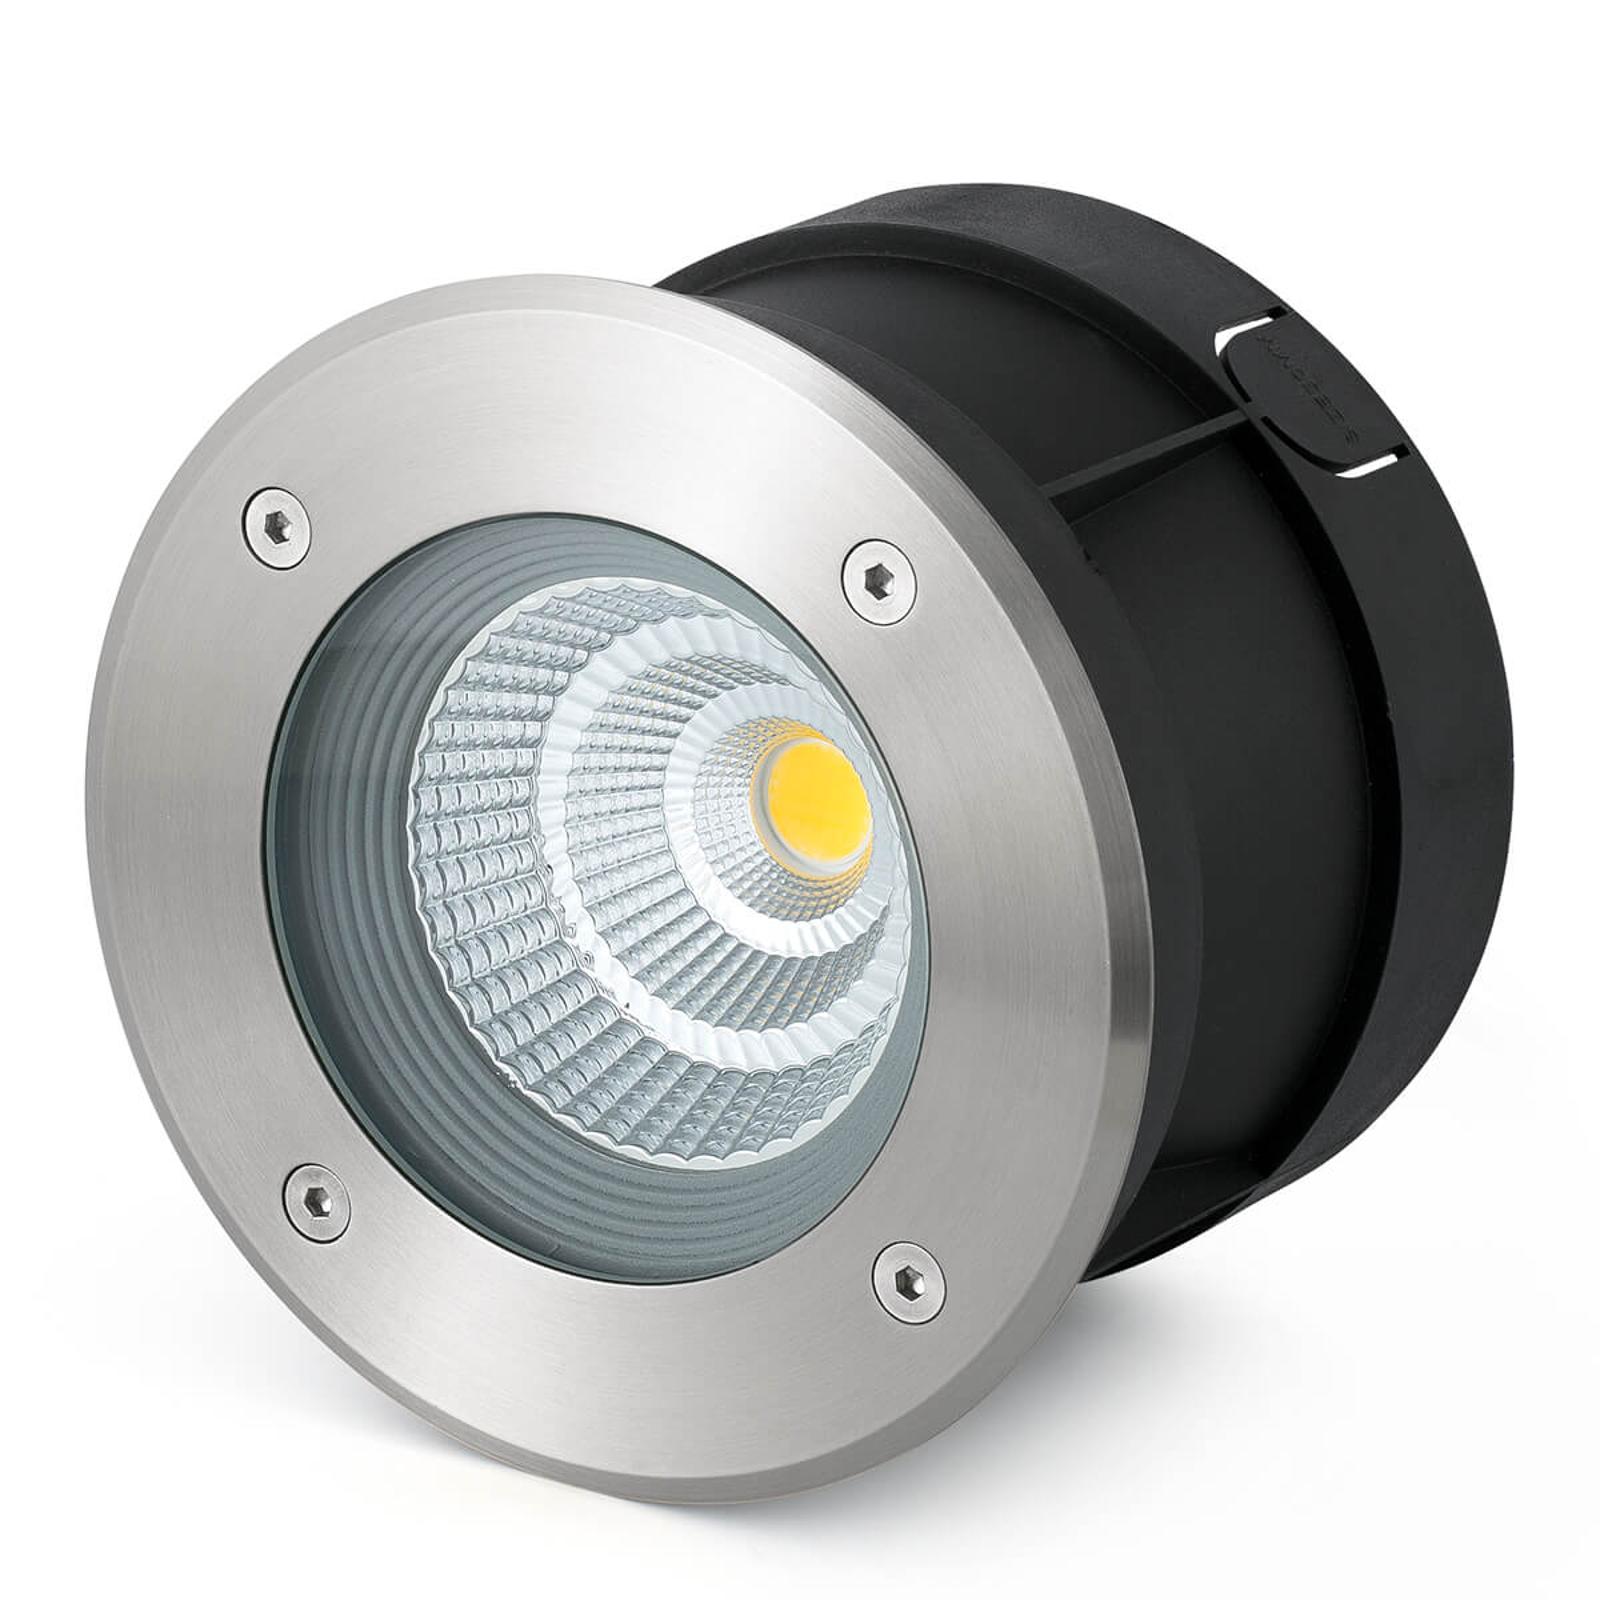 Suria-12 - LED-Bodeneinbauleuchte, IP67